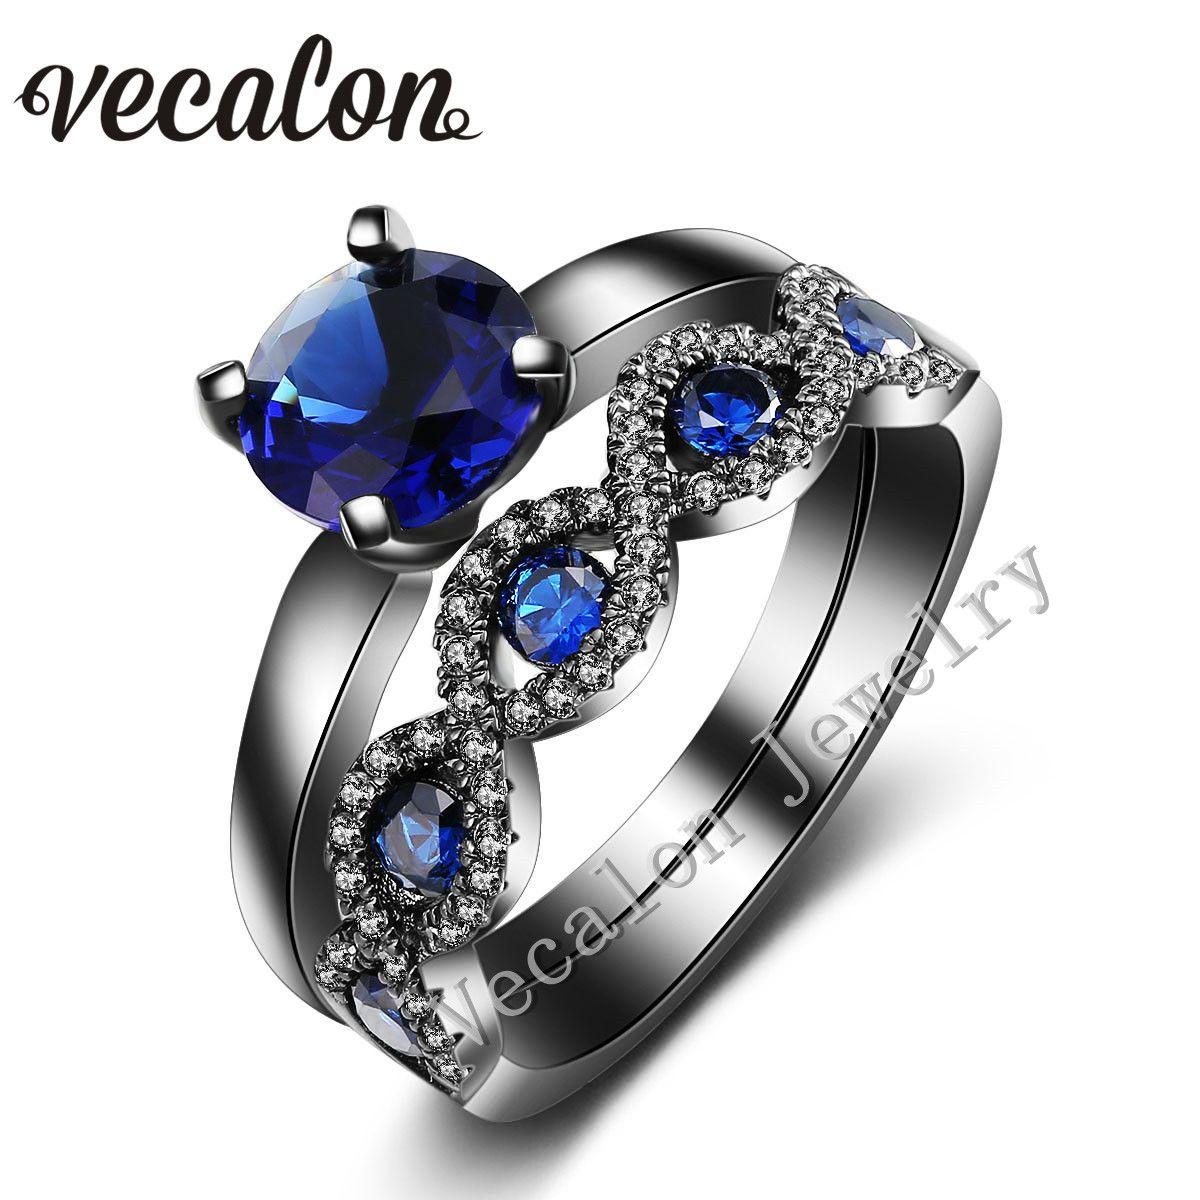 2019 Vecalon Cross Women Wedding Band Ring Set 2ct Blue Sapphire Simulated Diamond Cz 10kt Black Gold Filled Female Engagement From Simplefashion: Blue Shappire Black Wedding Band At Reisefeber.org